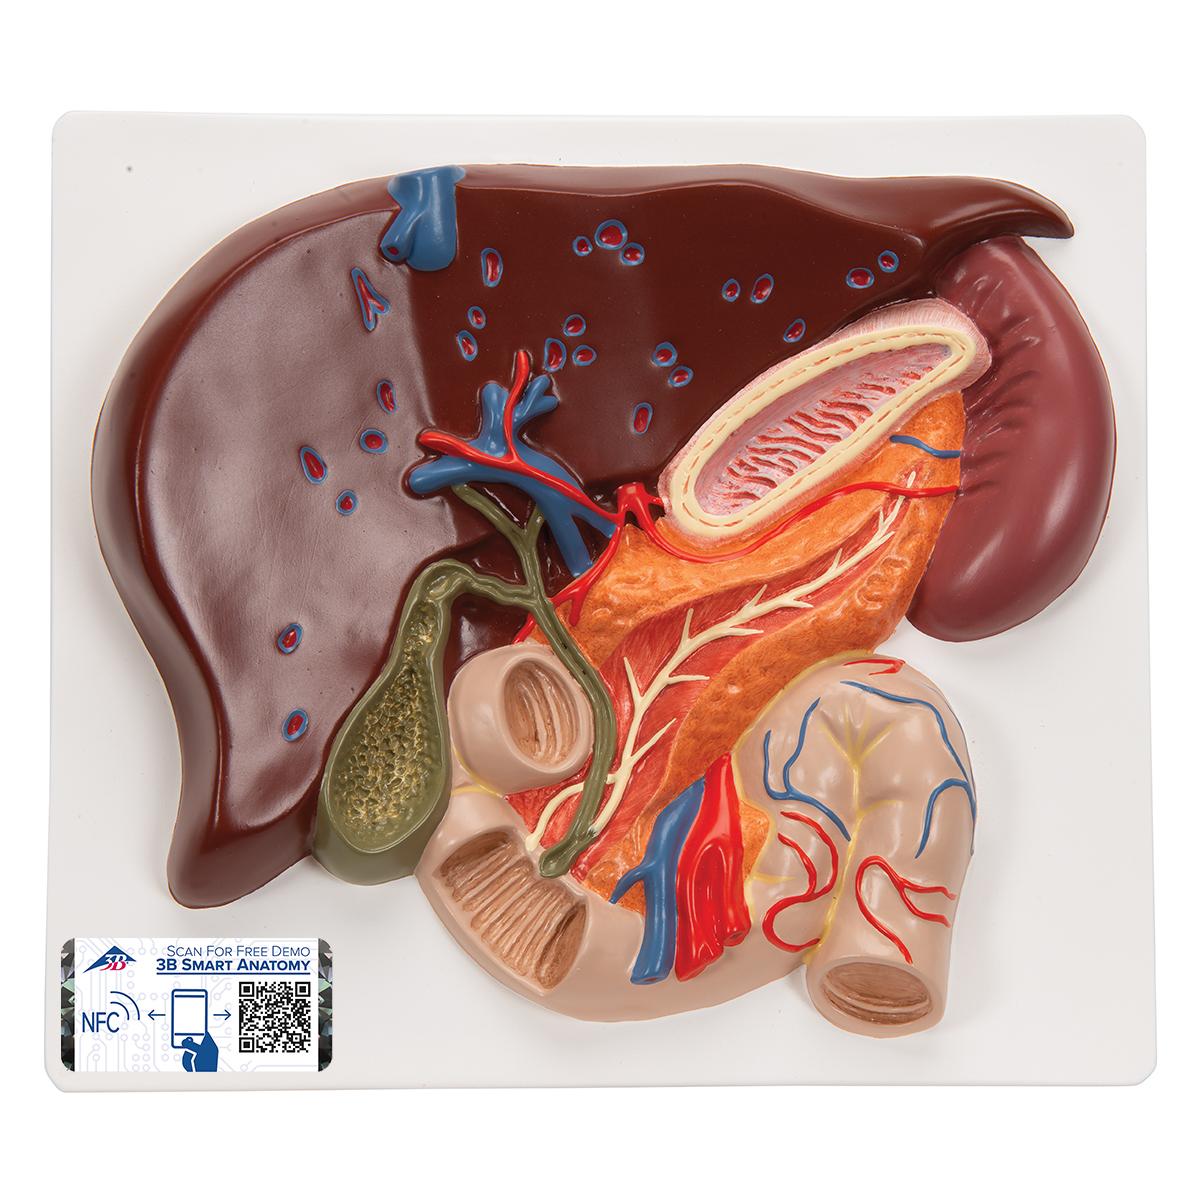 Anatomical Teaching Models - Plastic Human Digestive Models - Liver ...